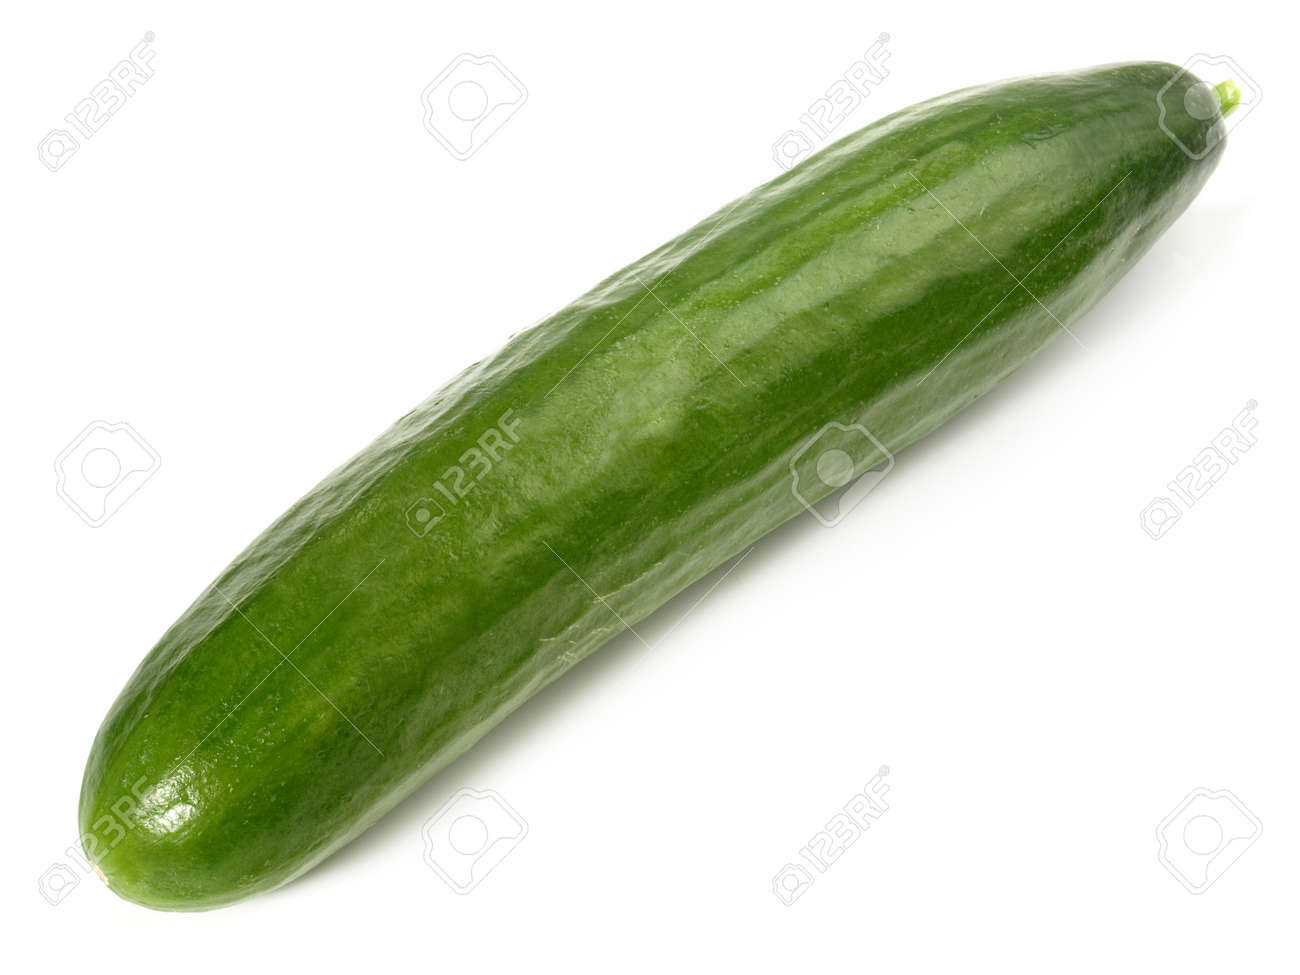 Cucumber - Isolated on white background - 165763627